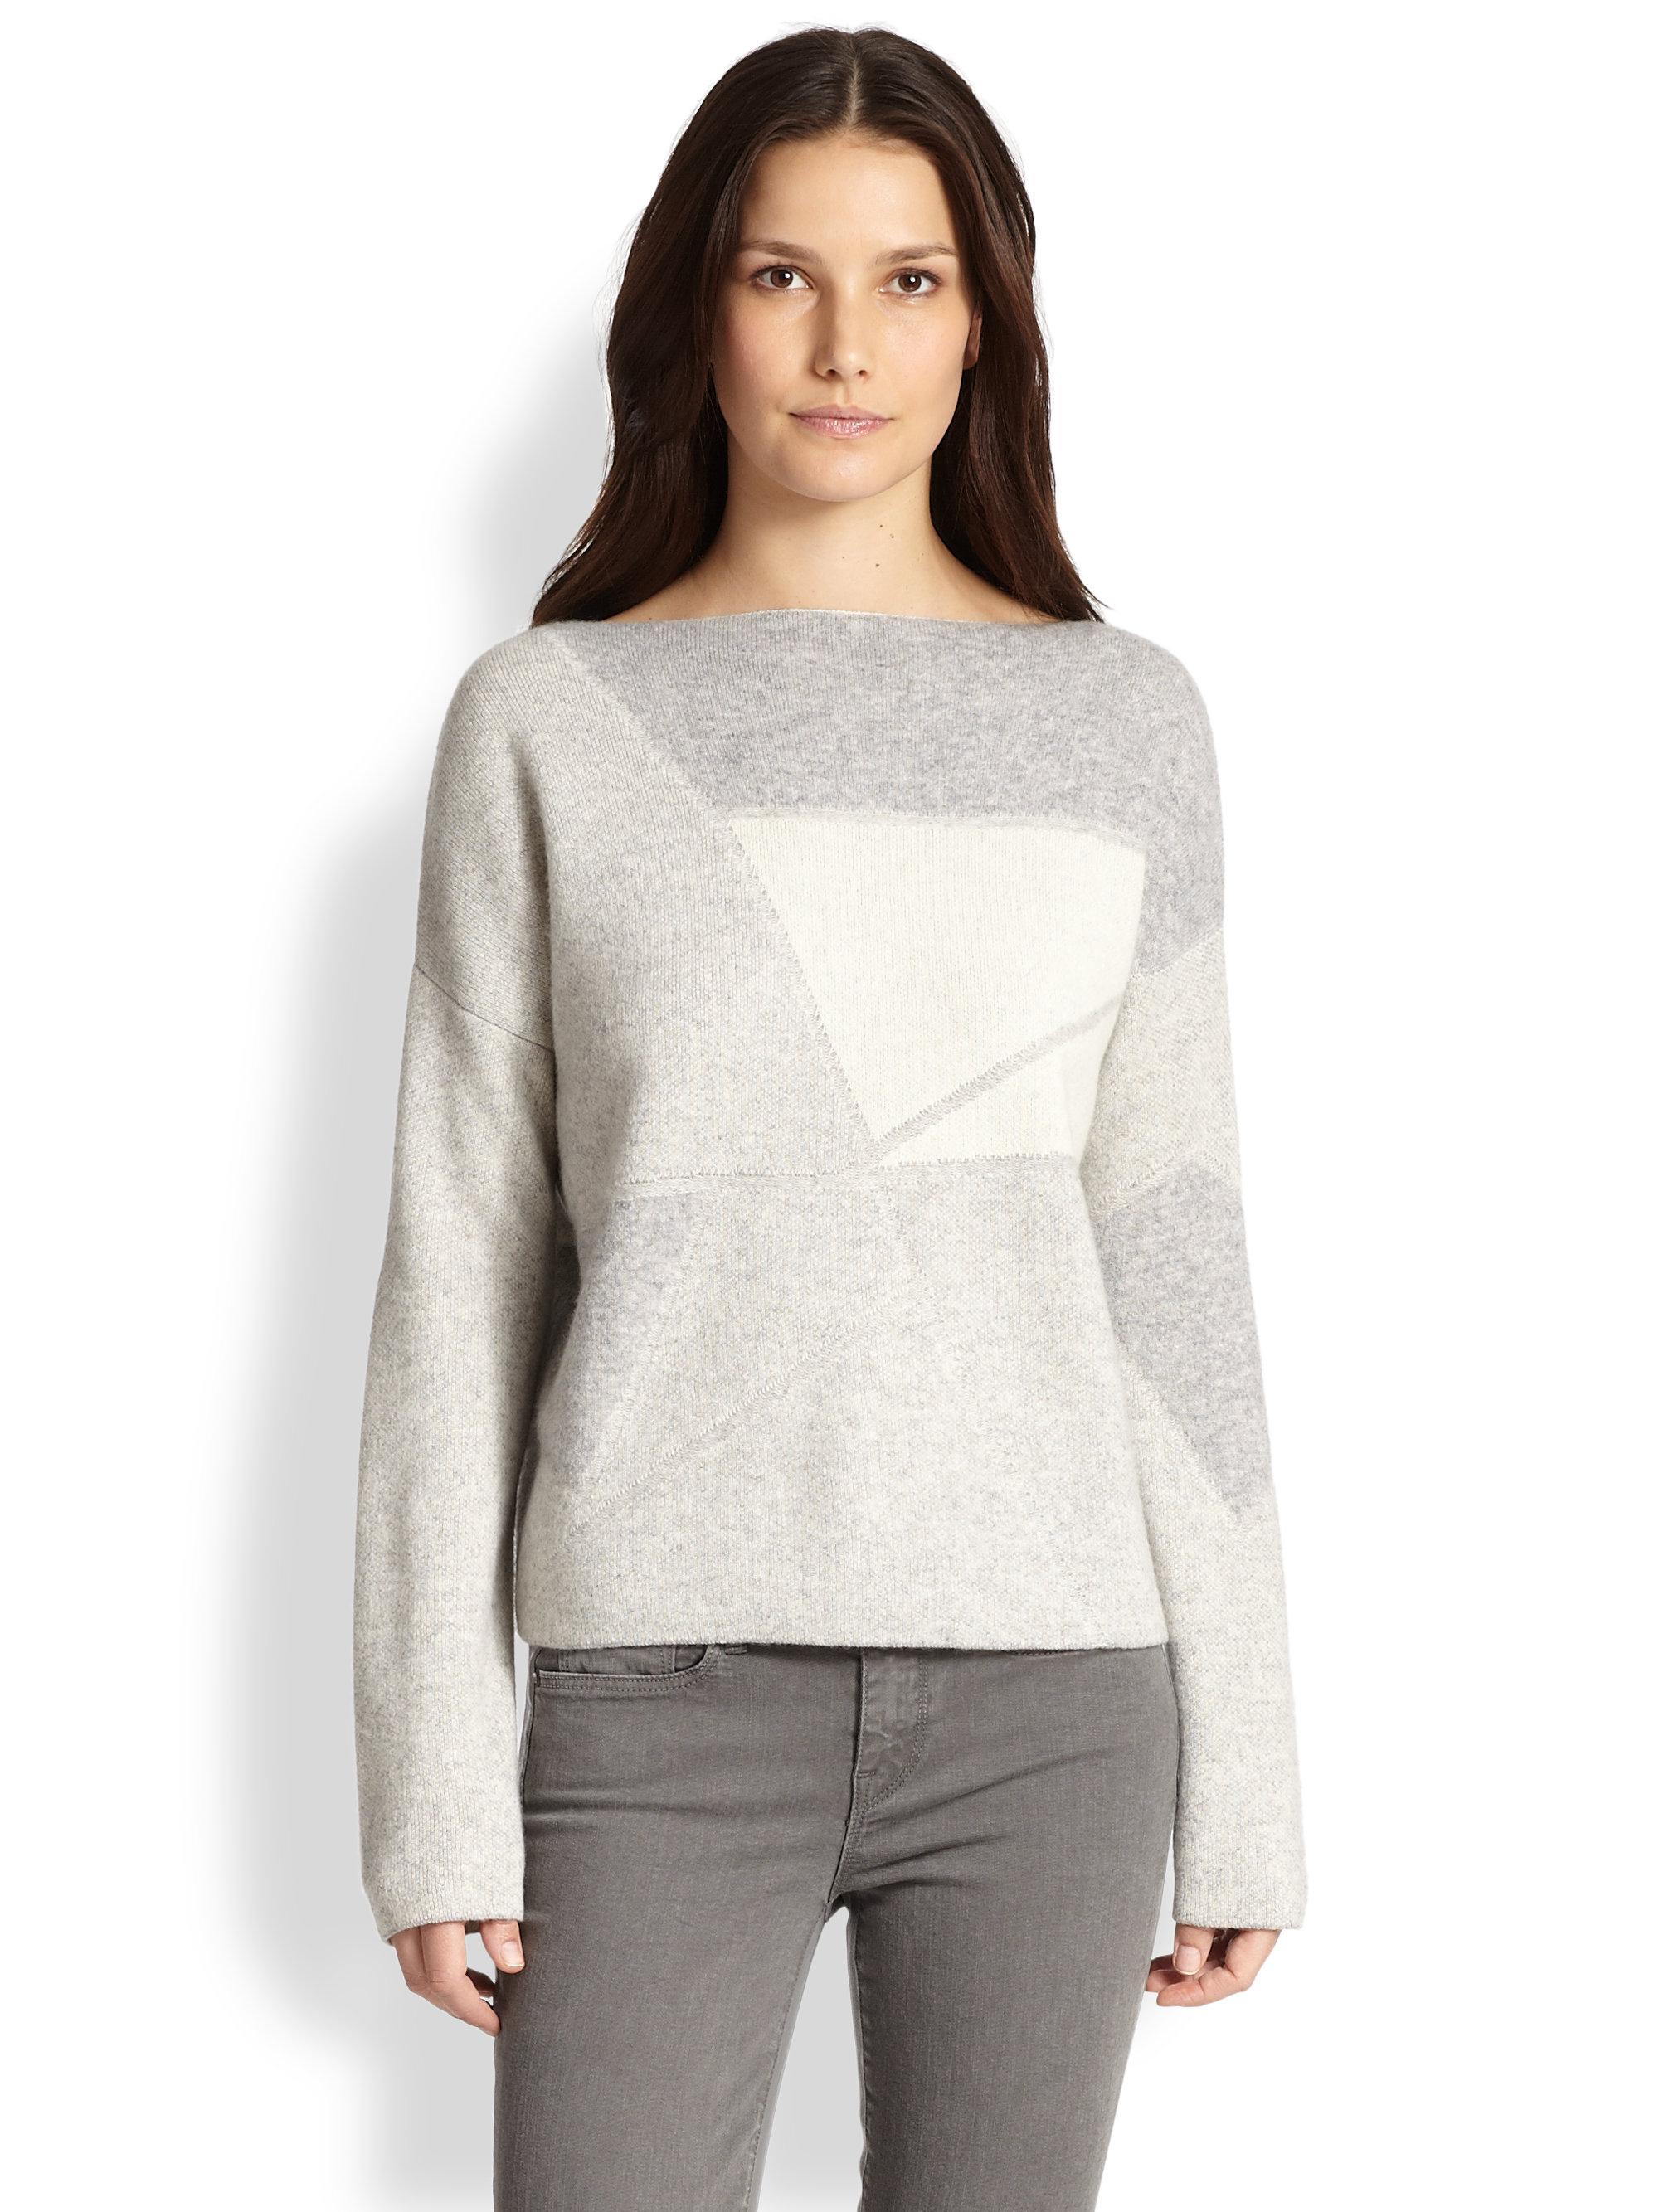 Wool Sweater Grey: Vince Wool & Cashmere Geometric Sweater In Gray